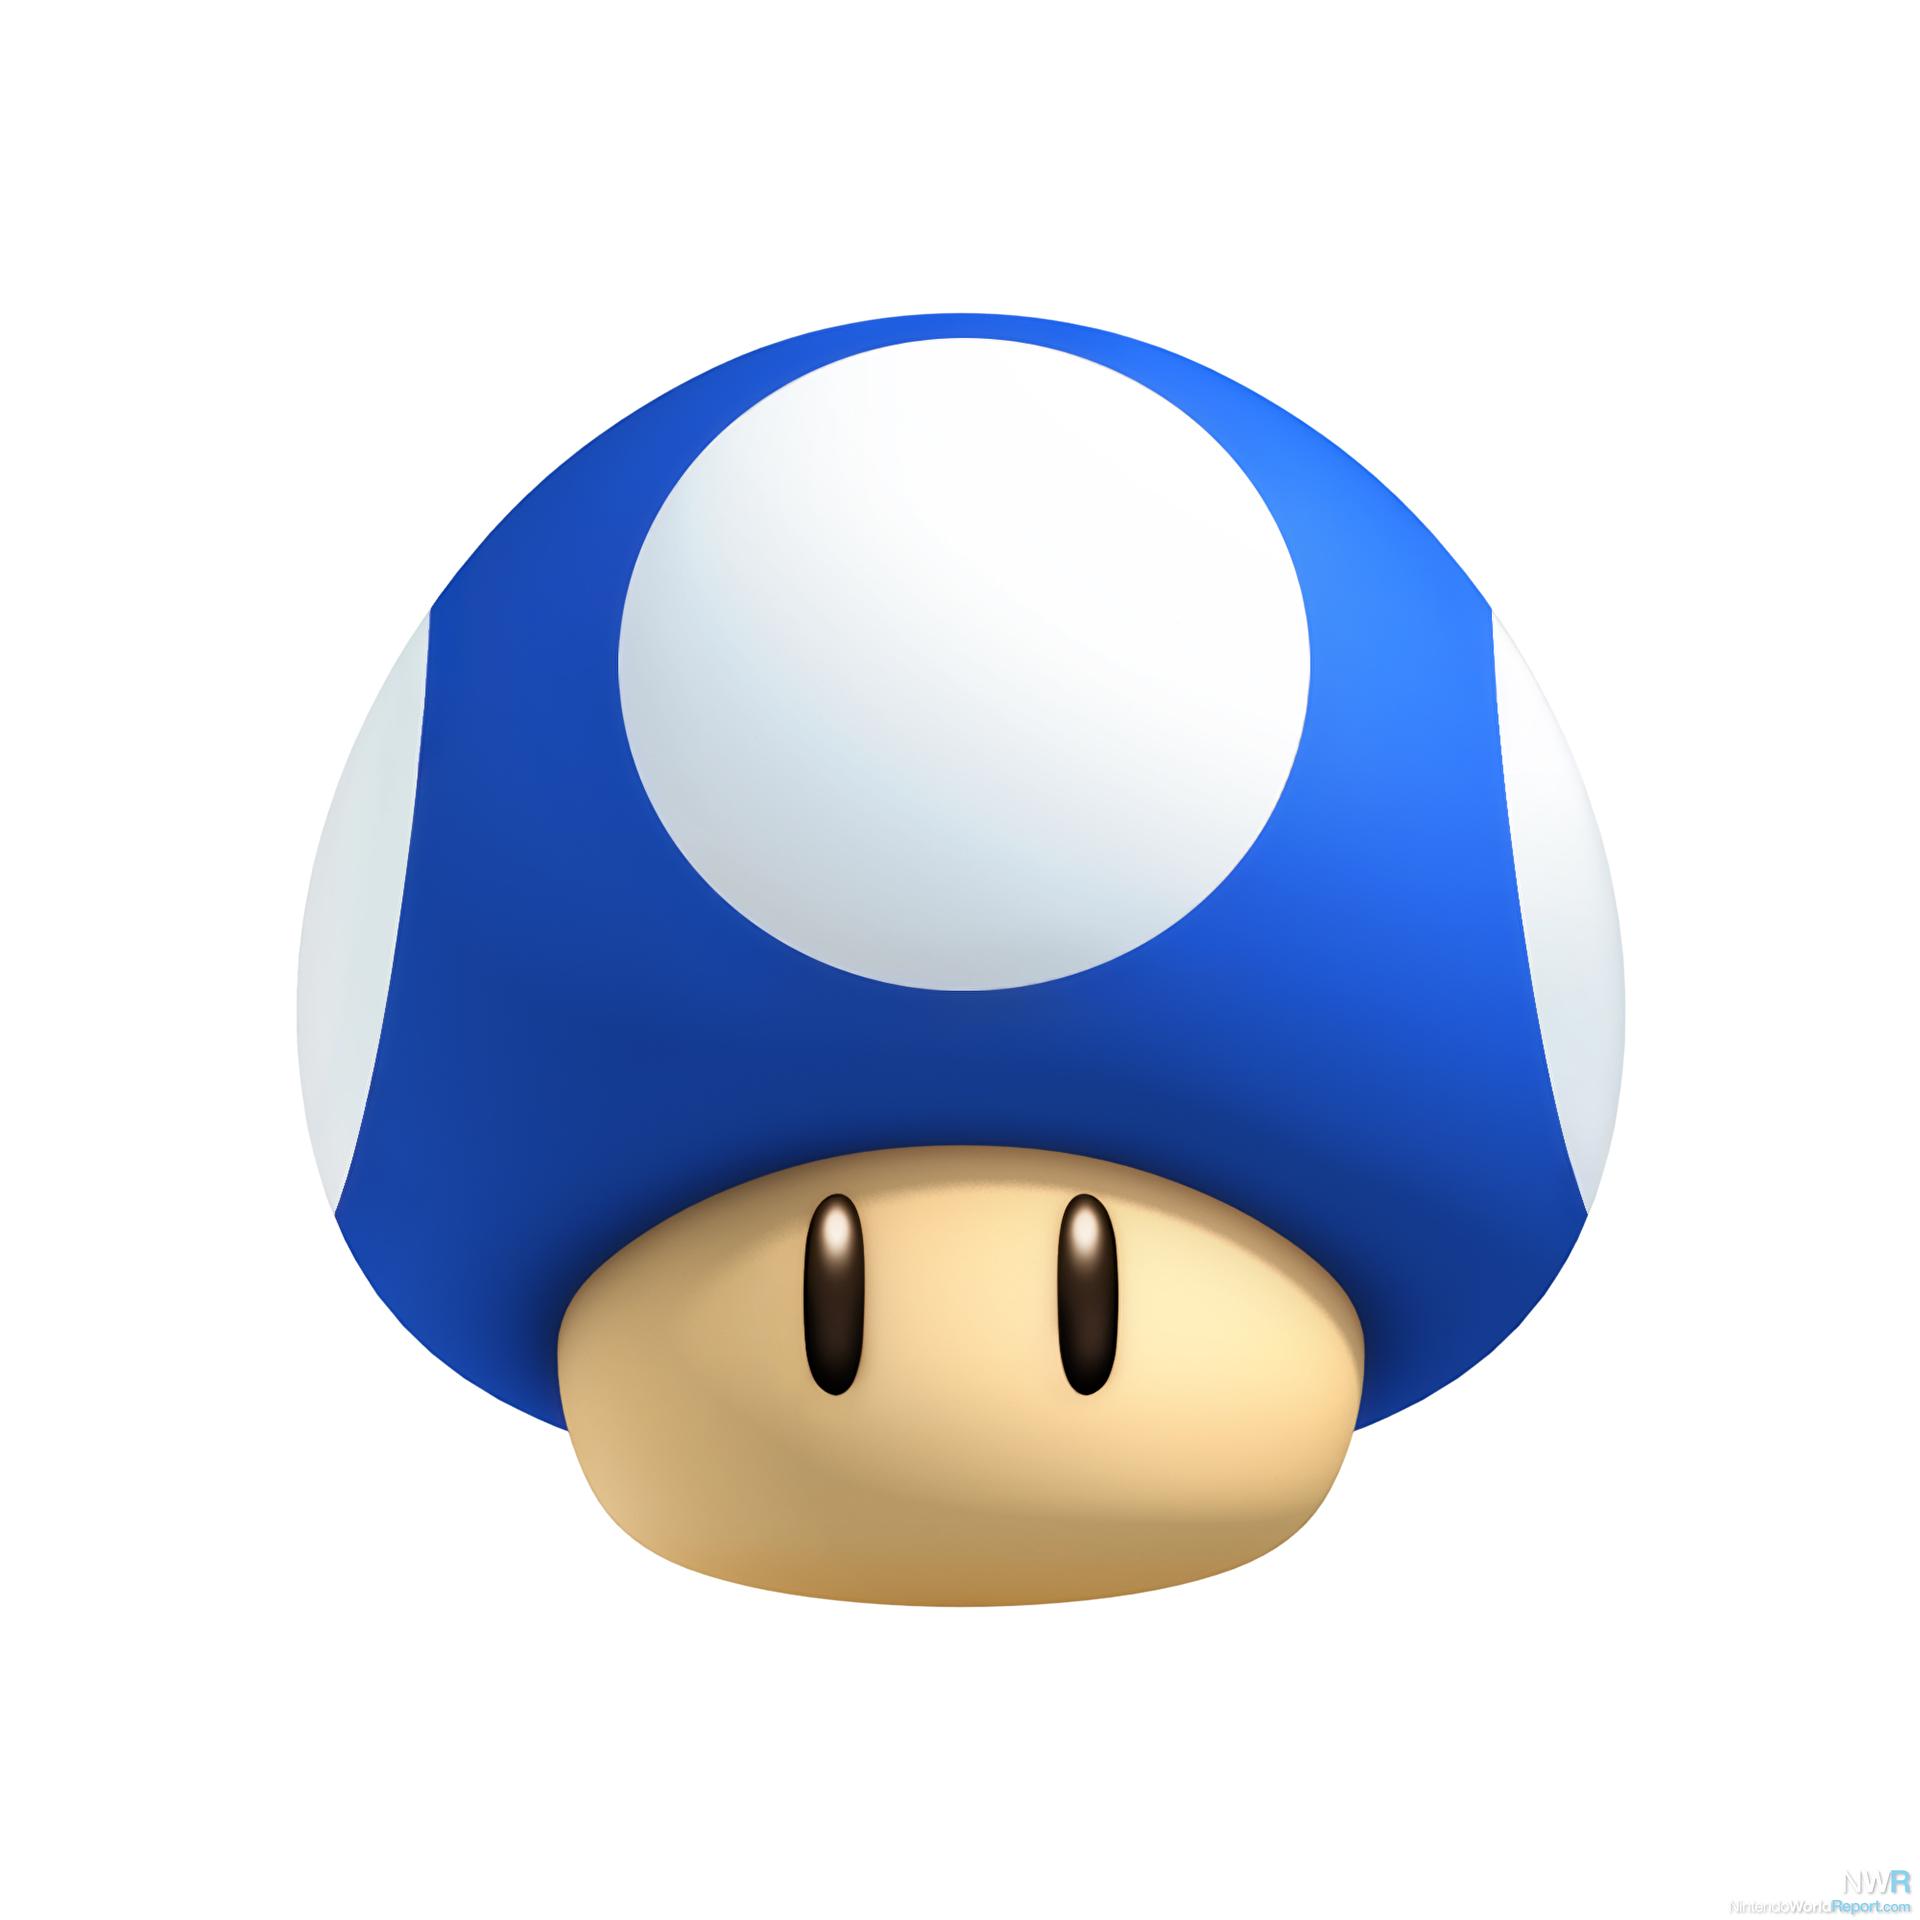 1920x1920 Mushroom Clipart Mario Brothers 3730589